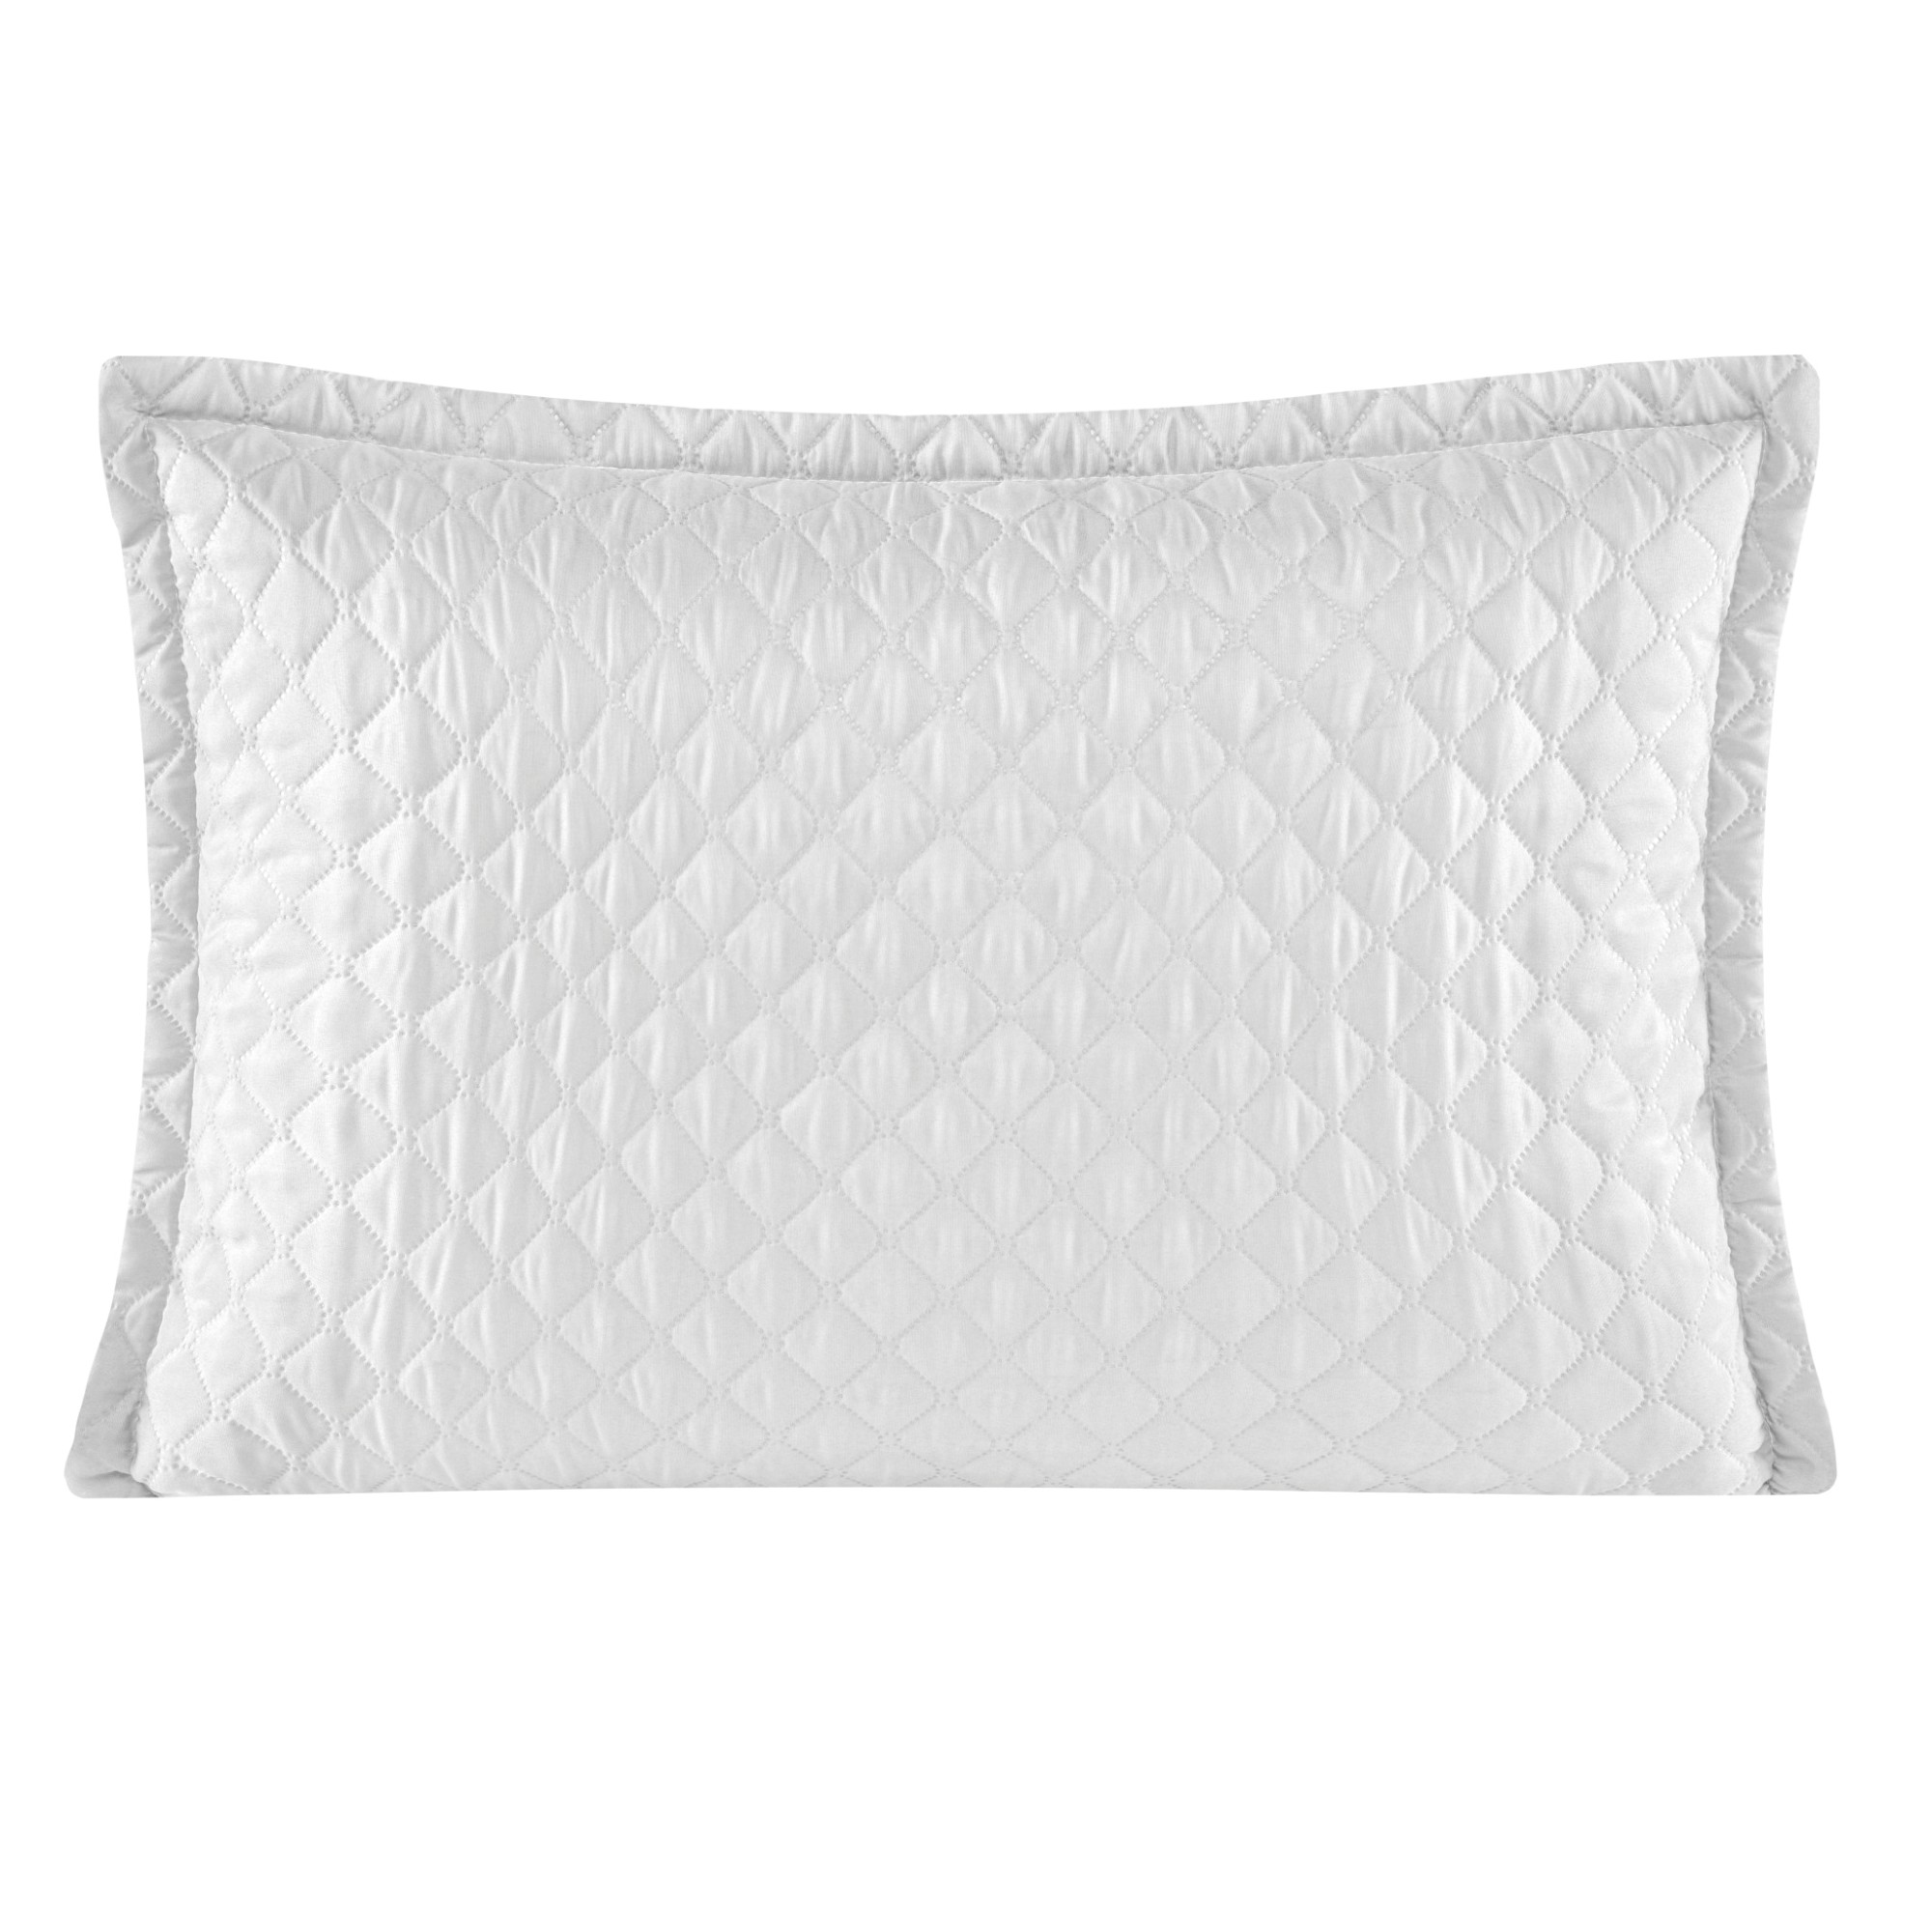 Porta Travesseiro 50 x 70 cm Delicata Branco - Yohana